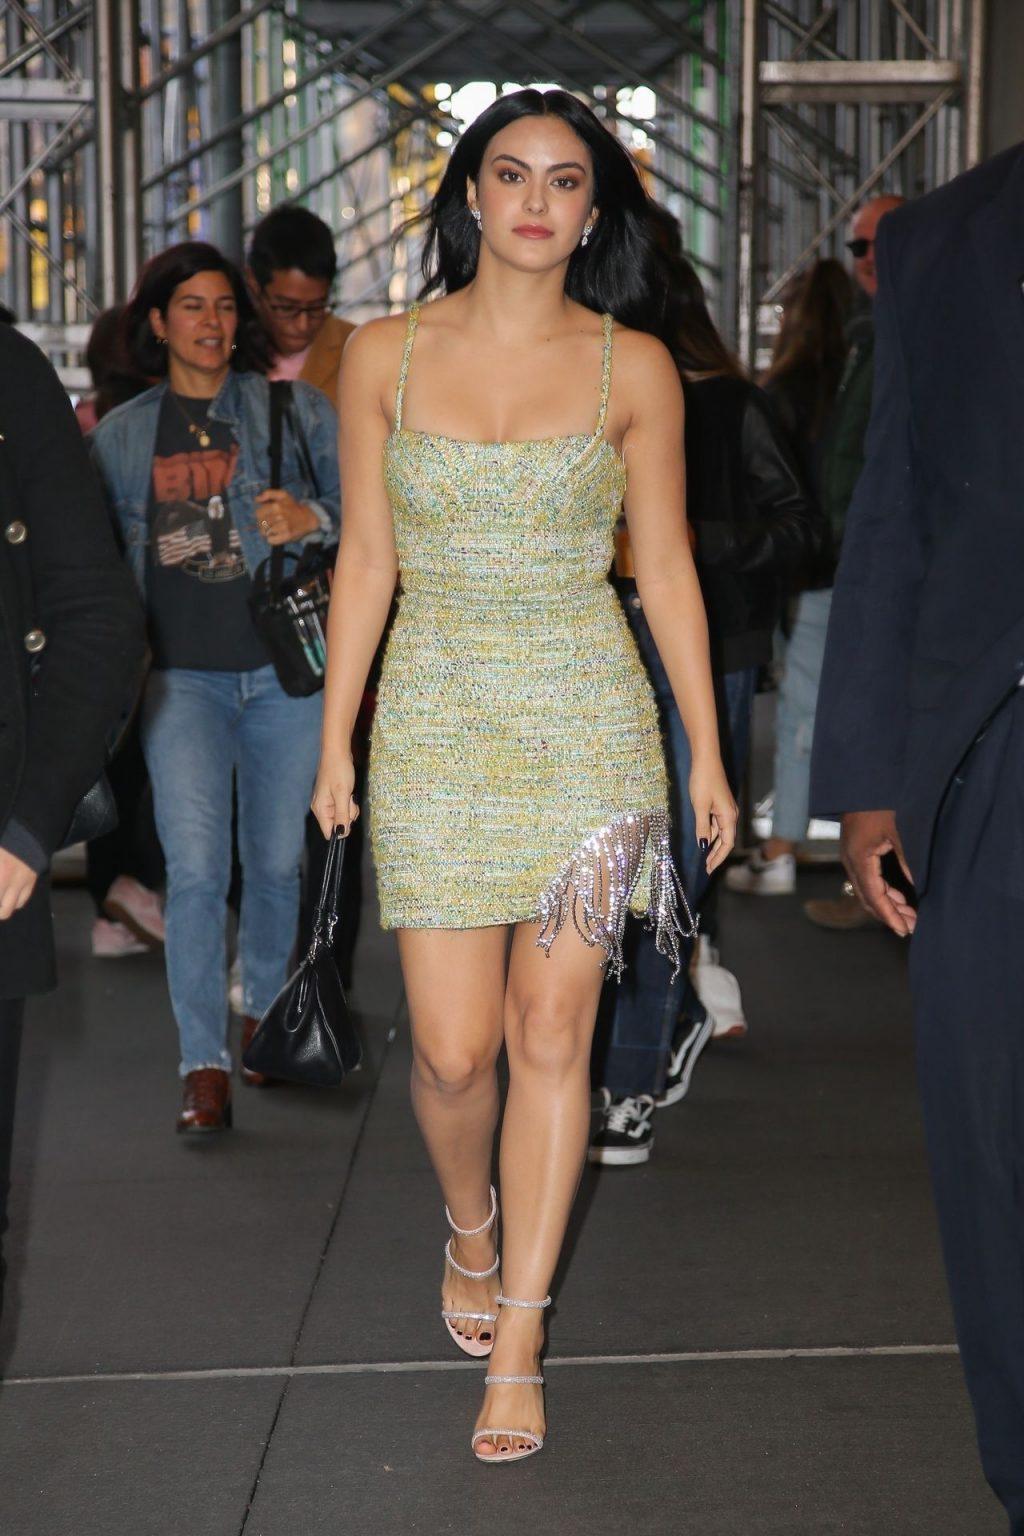 Camila Mendes Hot